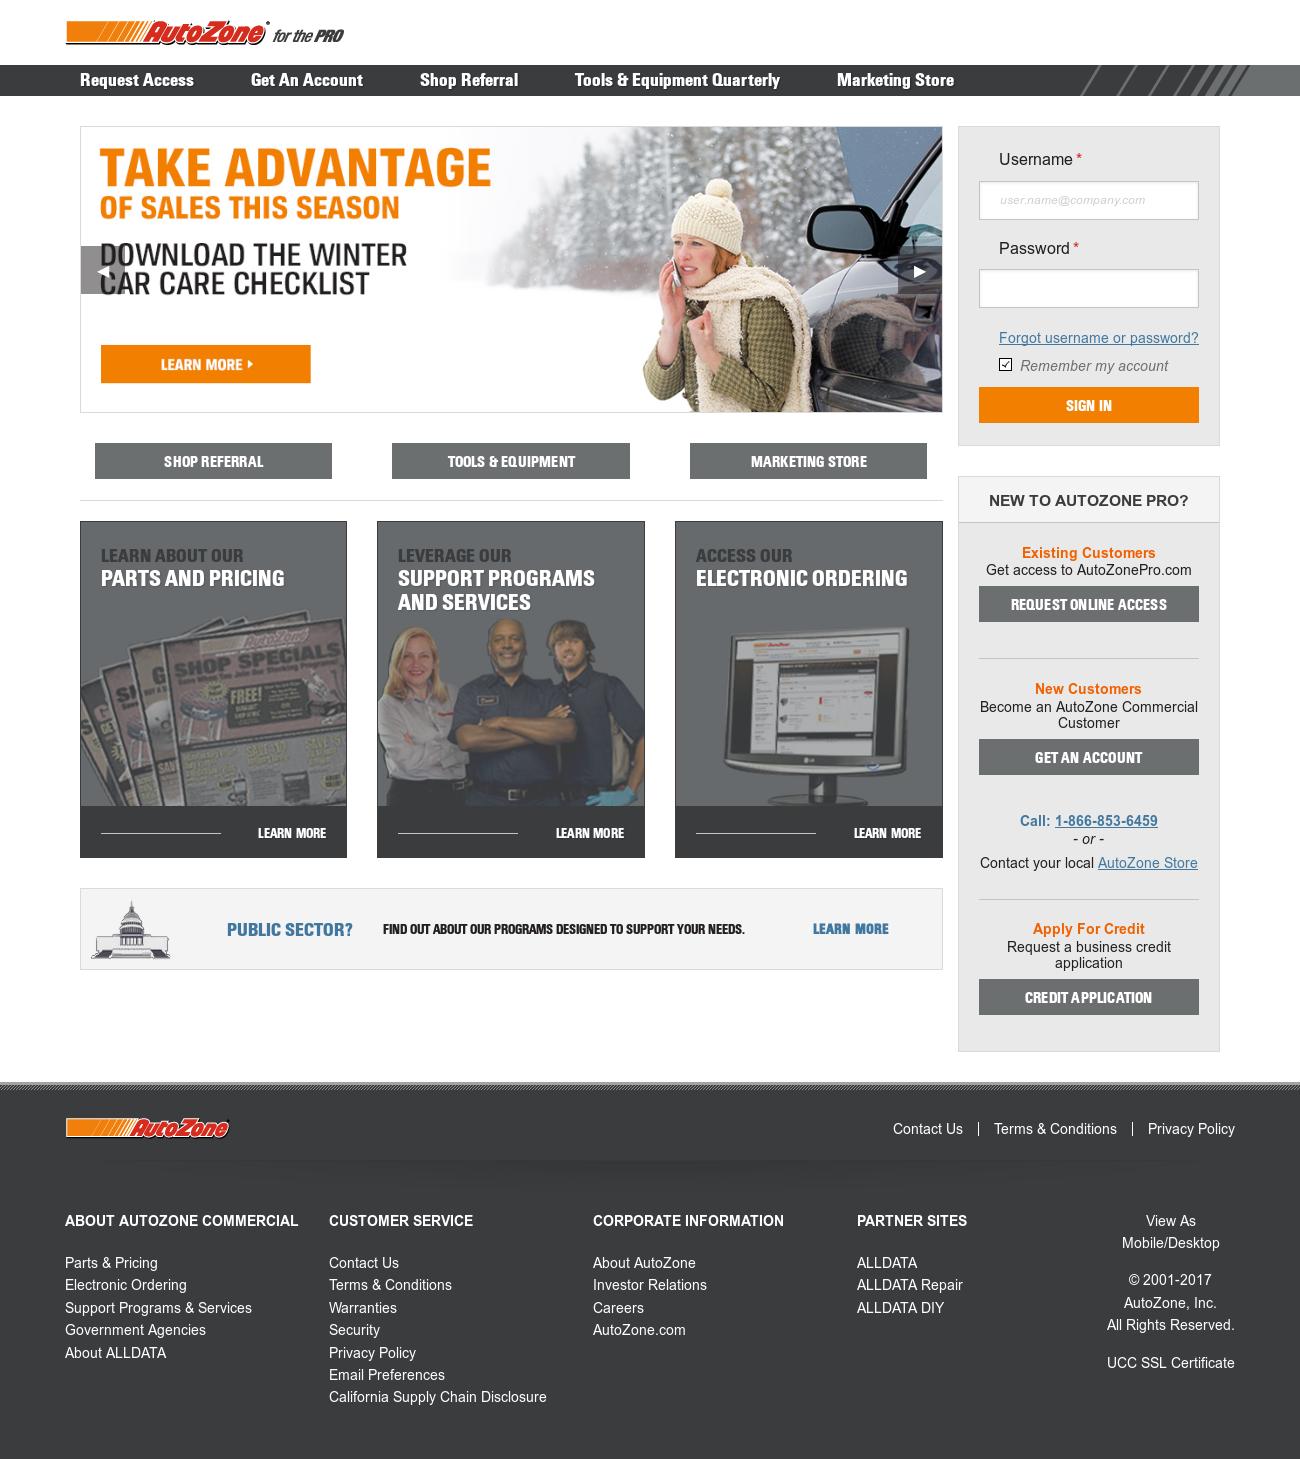 Owler Reports - Press Release: Autozone : AutoZone to